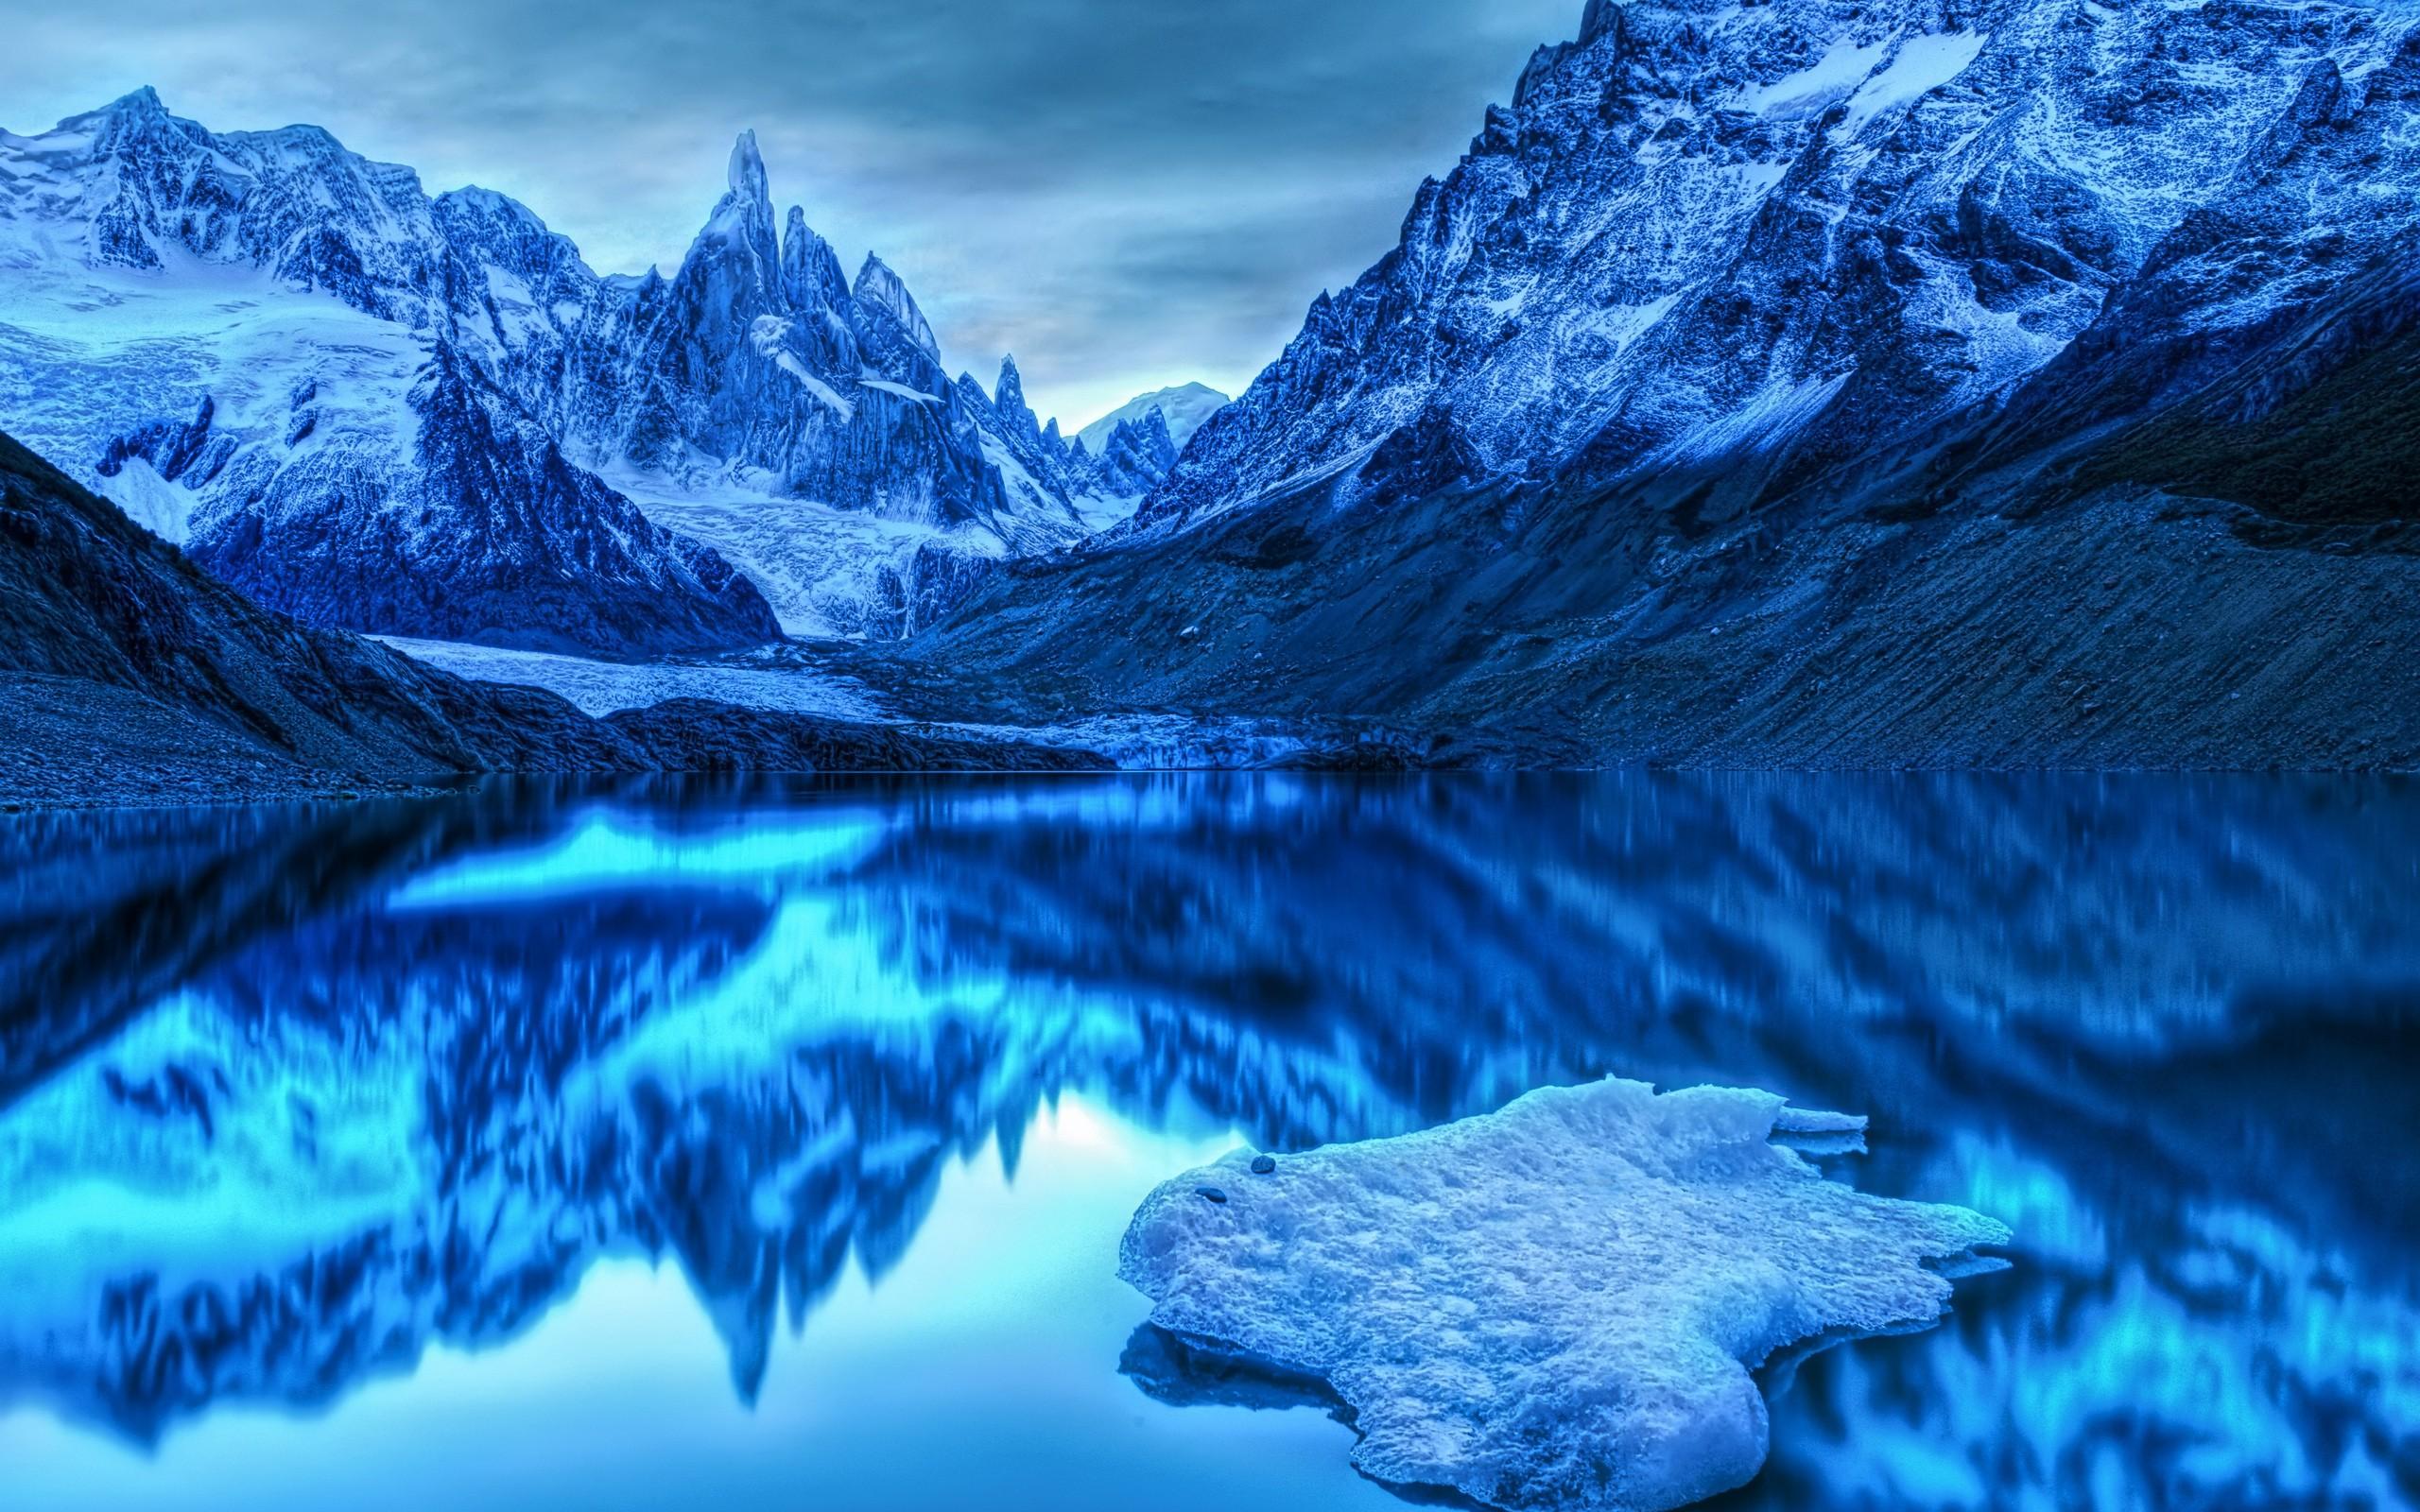 Winter Mountain Wallpaper Hd